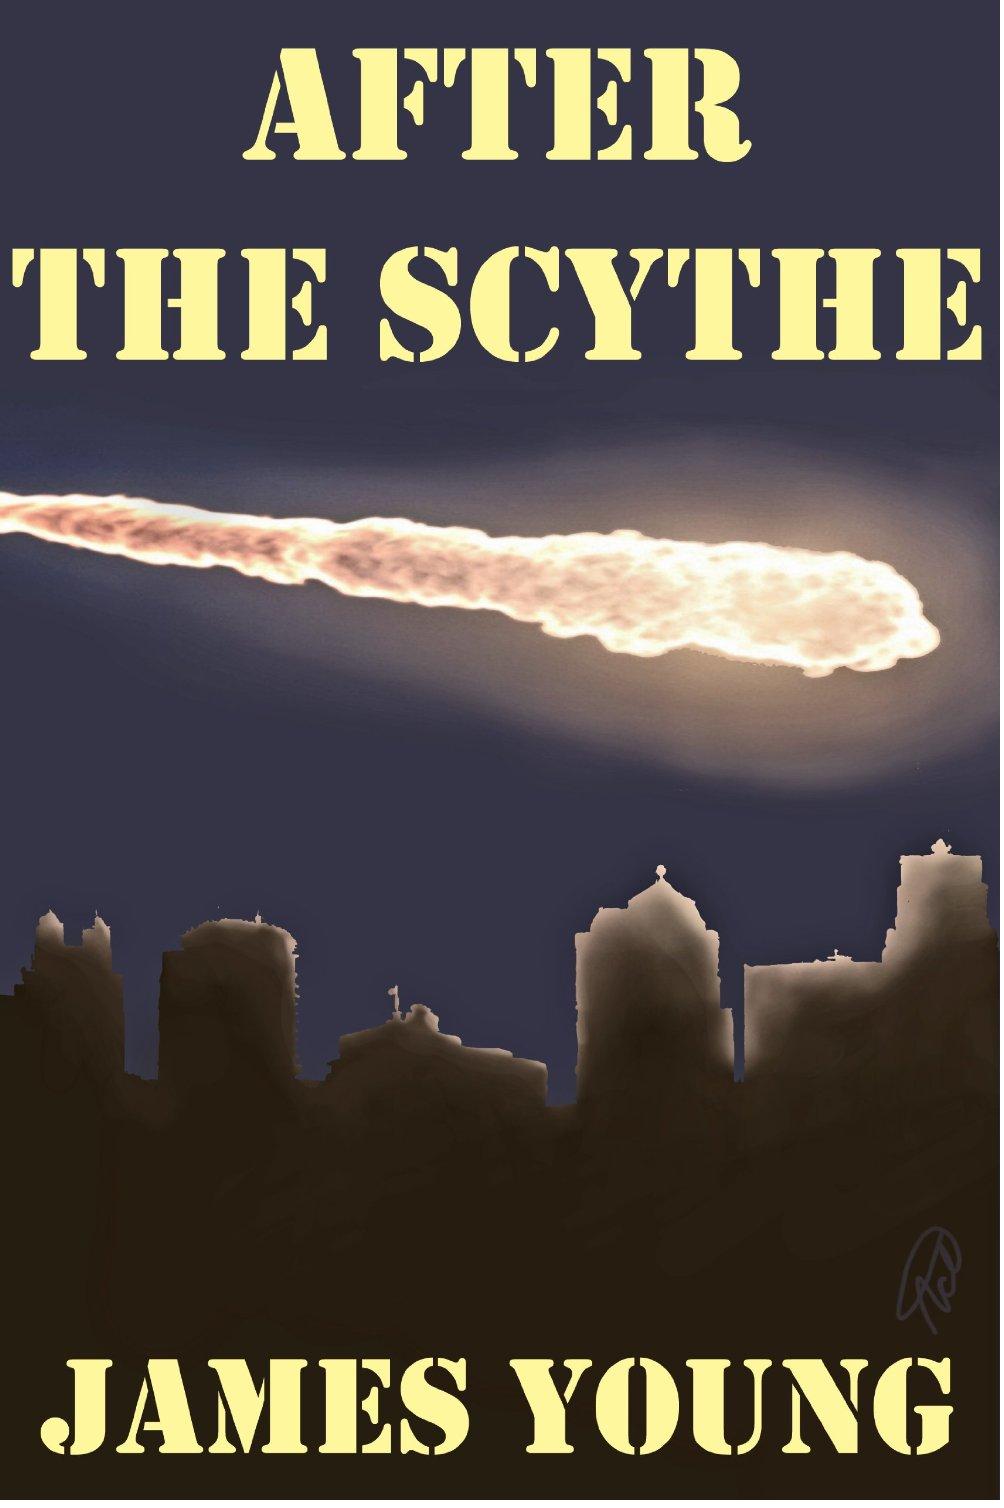 After The Scythe